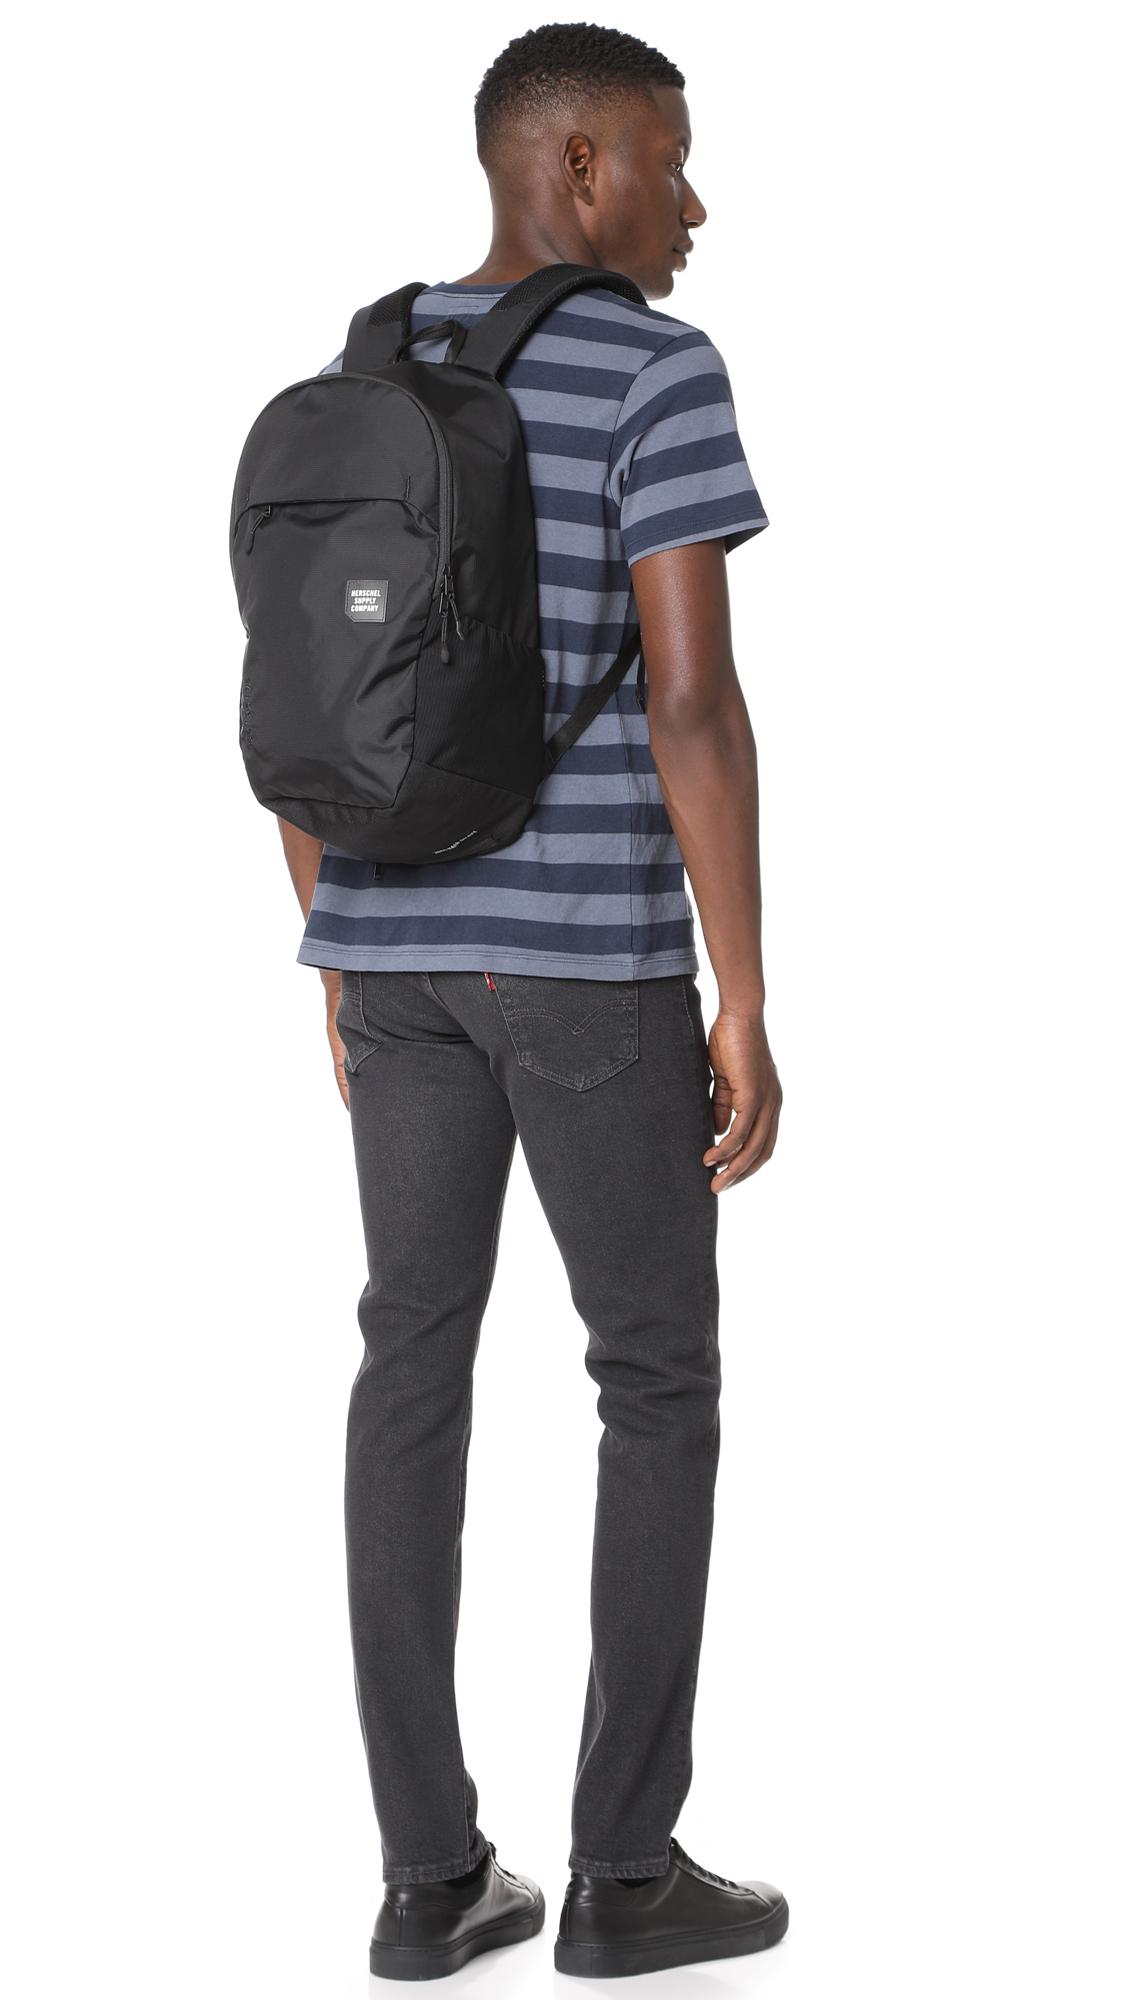 3d0a36a00bf Herschel Supply Co. Trail Mammoth Medium Backpack